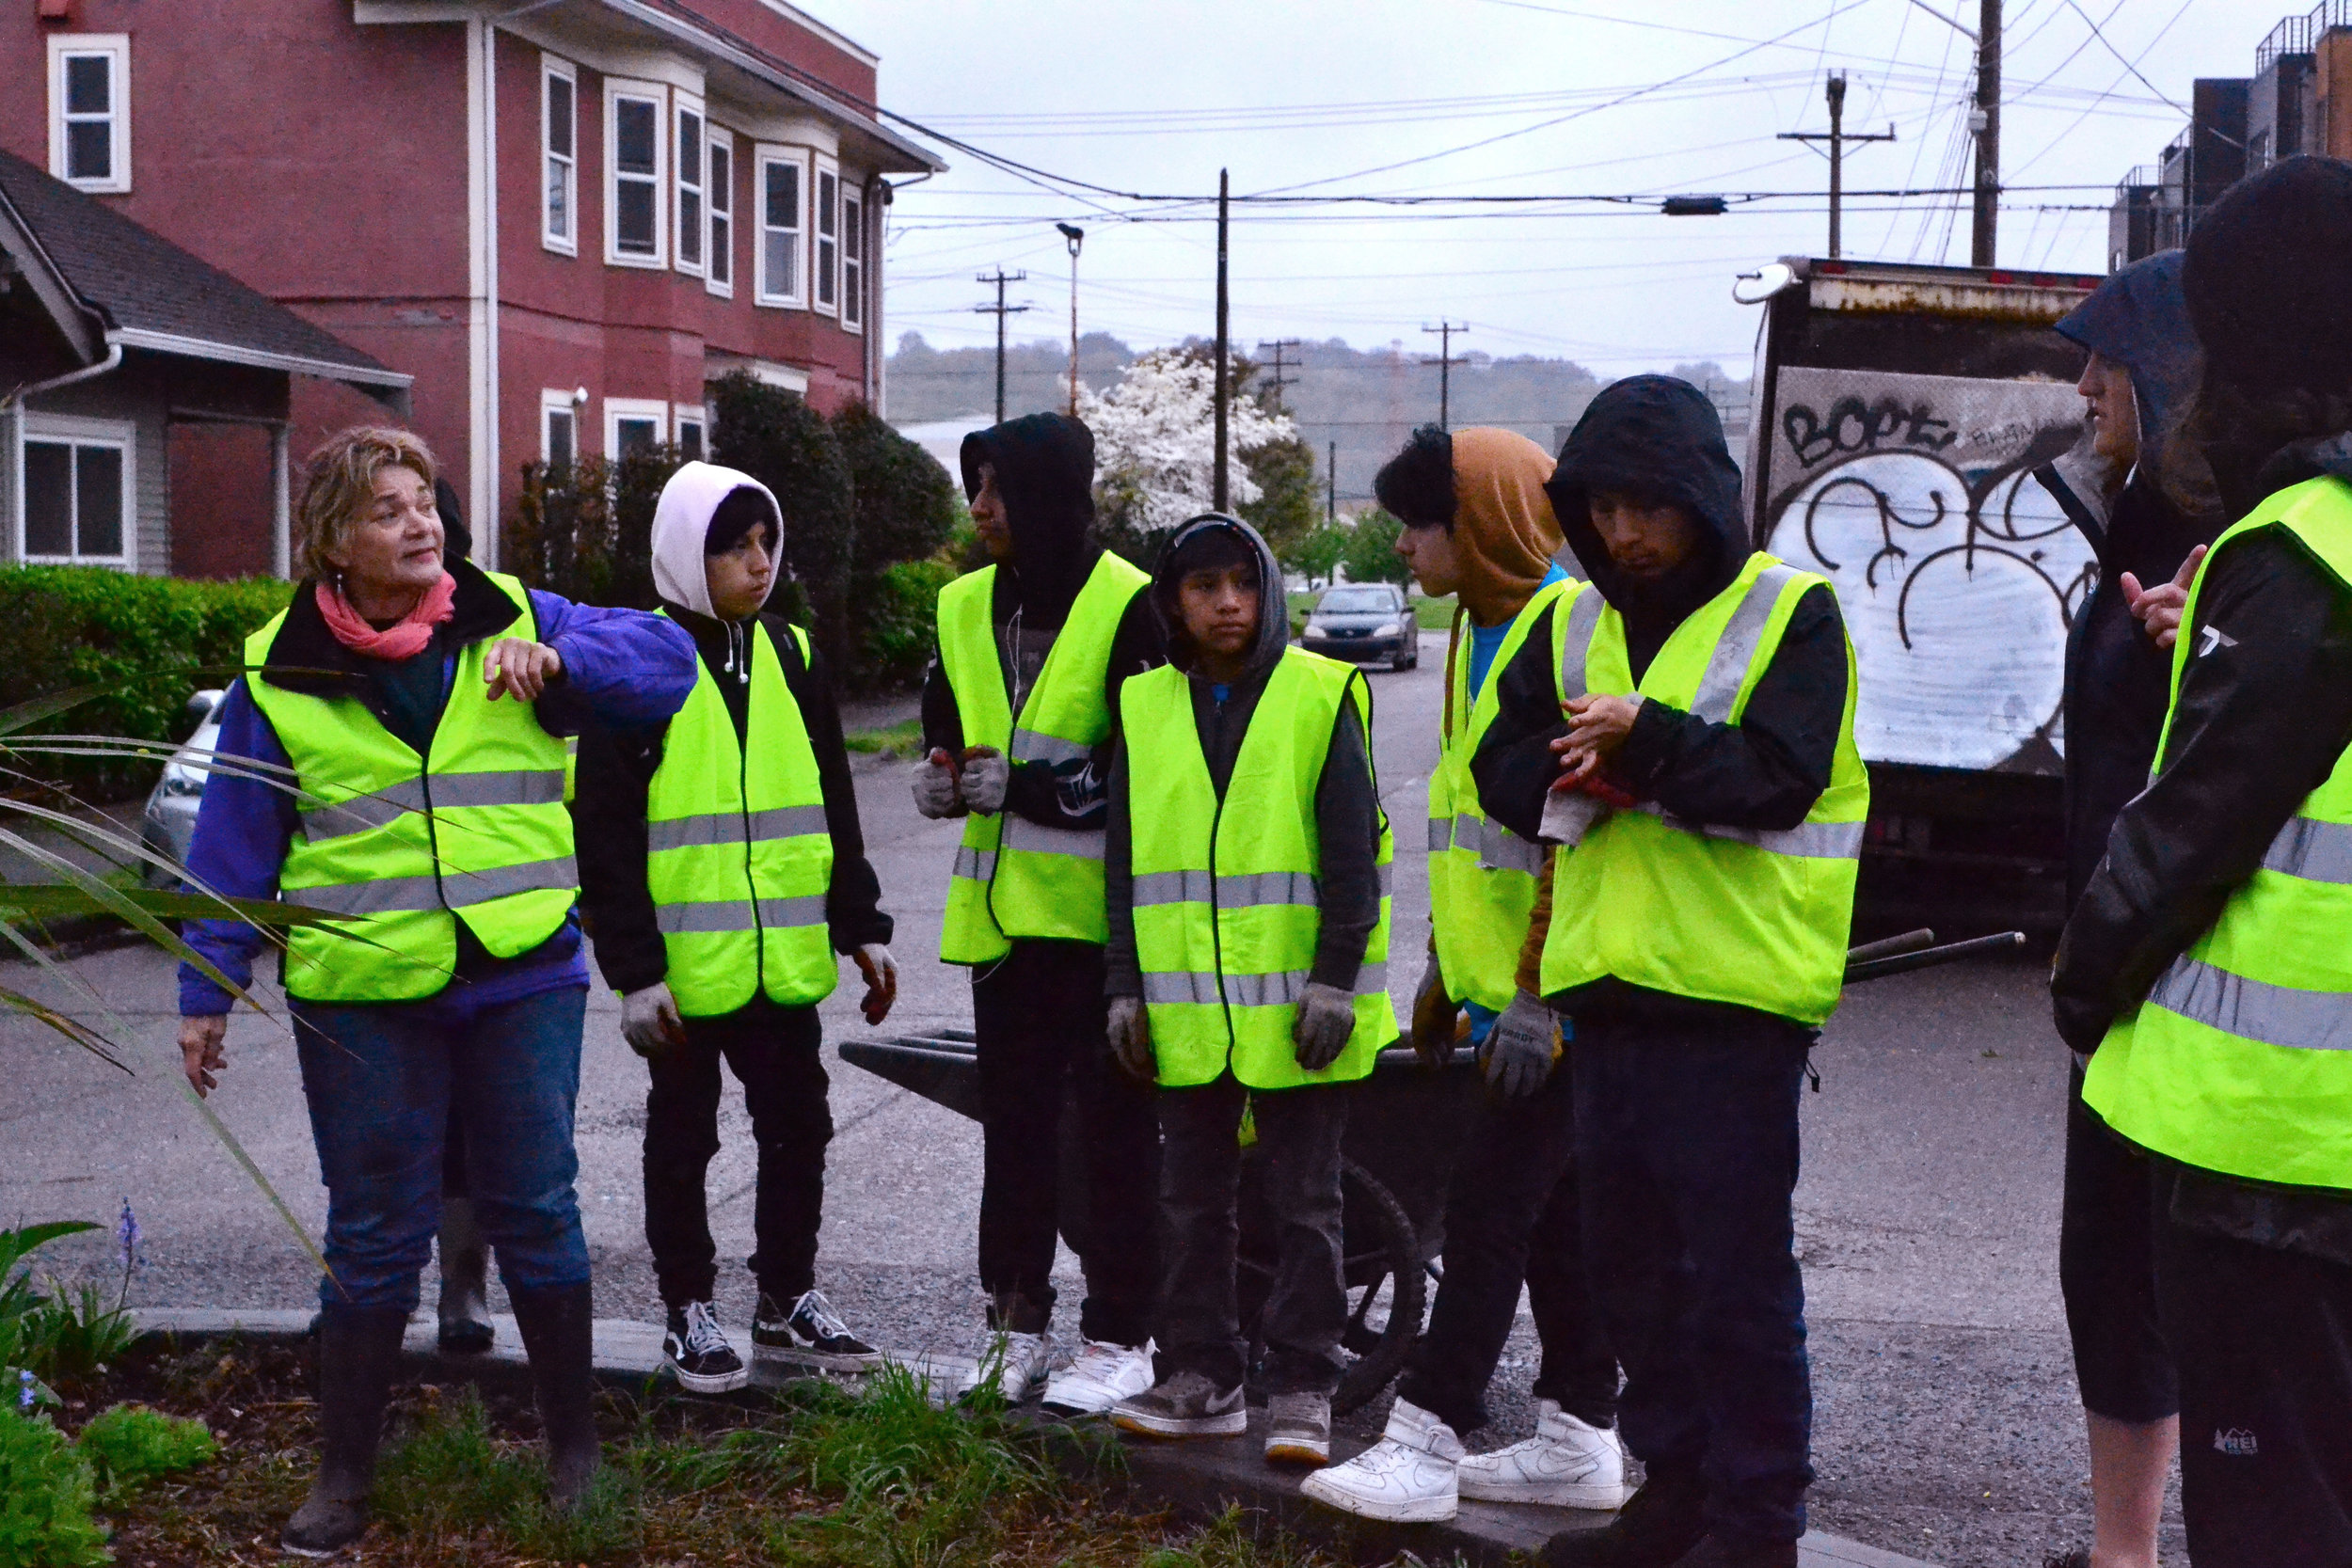 Nancy Zugschwerdt, a community steward, teaching the DVYC and volunteers about stewarding traffic circles. Photo © Paula Kett